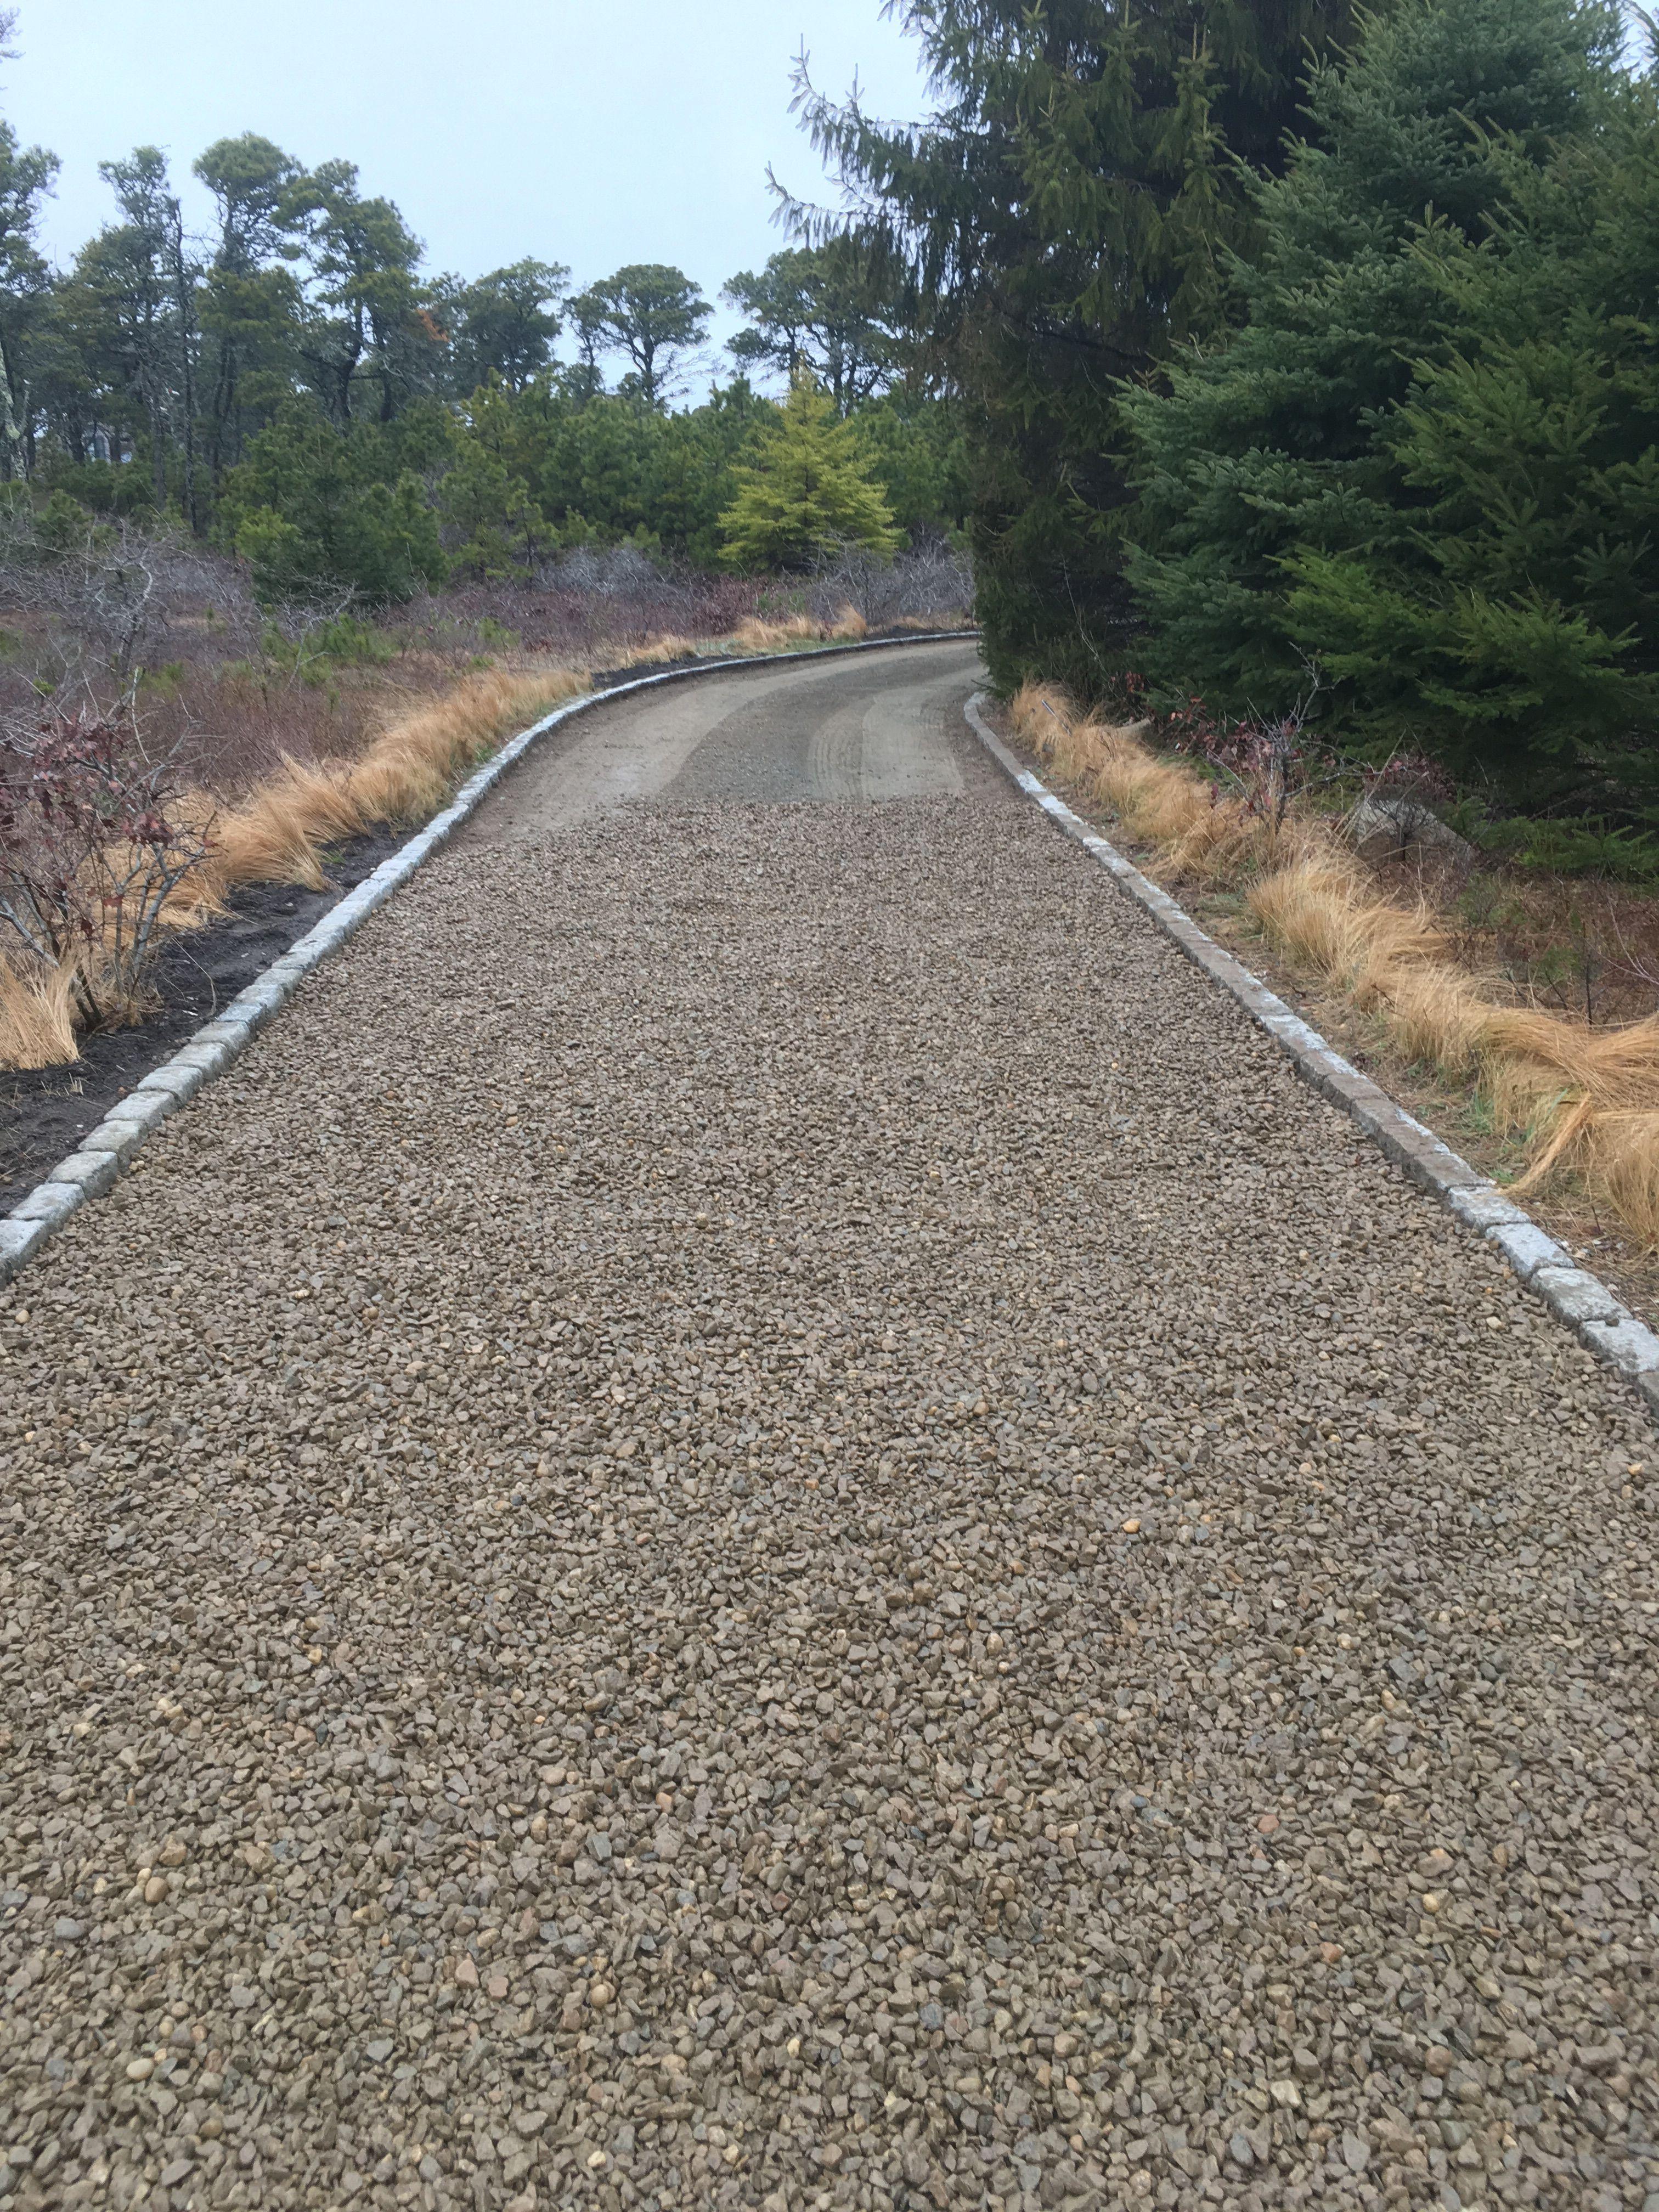 Belgium Block Driveway Edging Nantucket Driveway Edging Stone Driveway Driveway Design